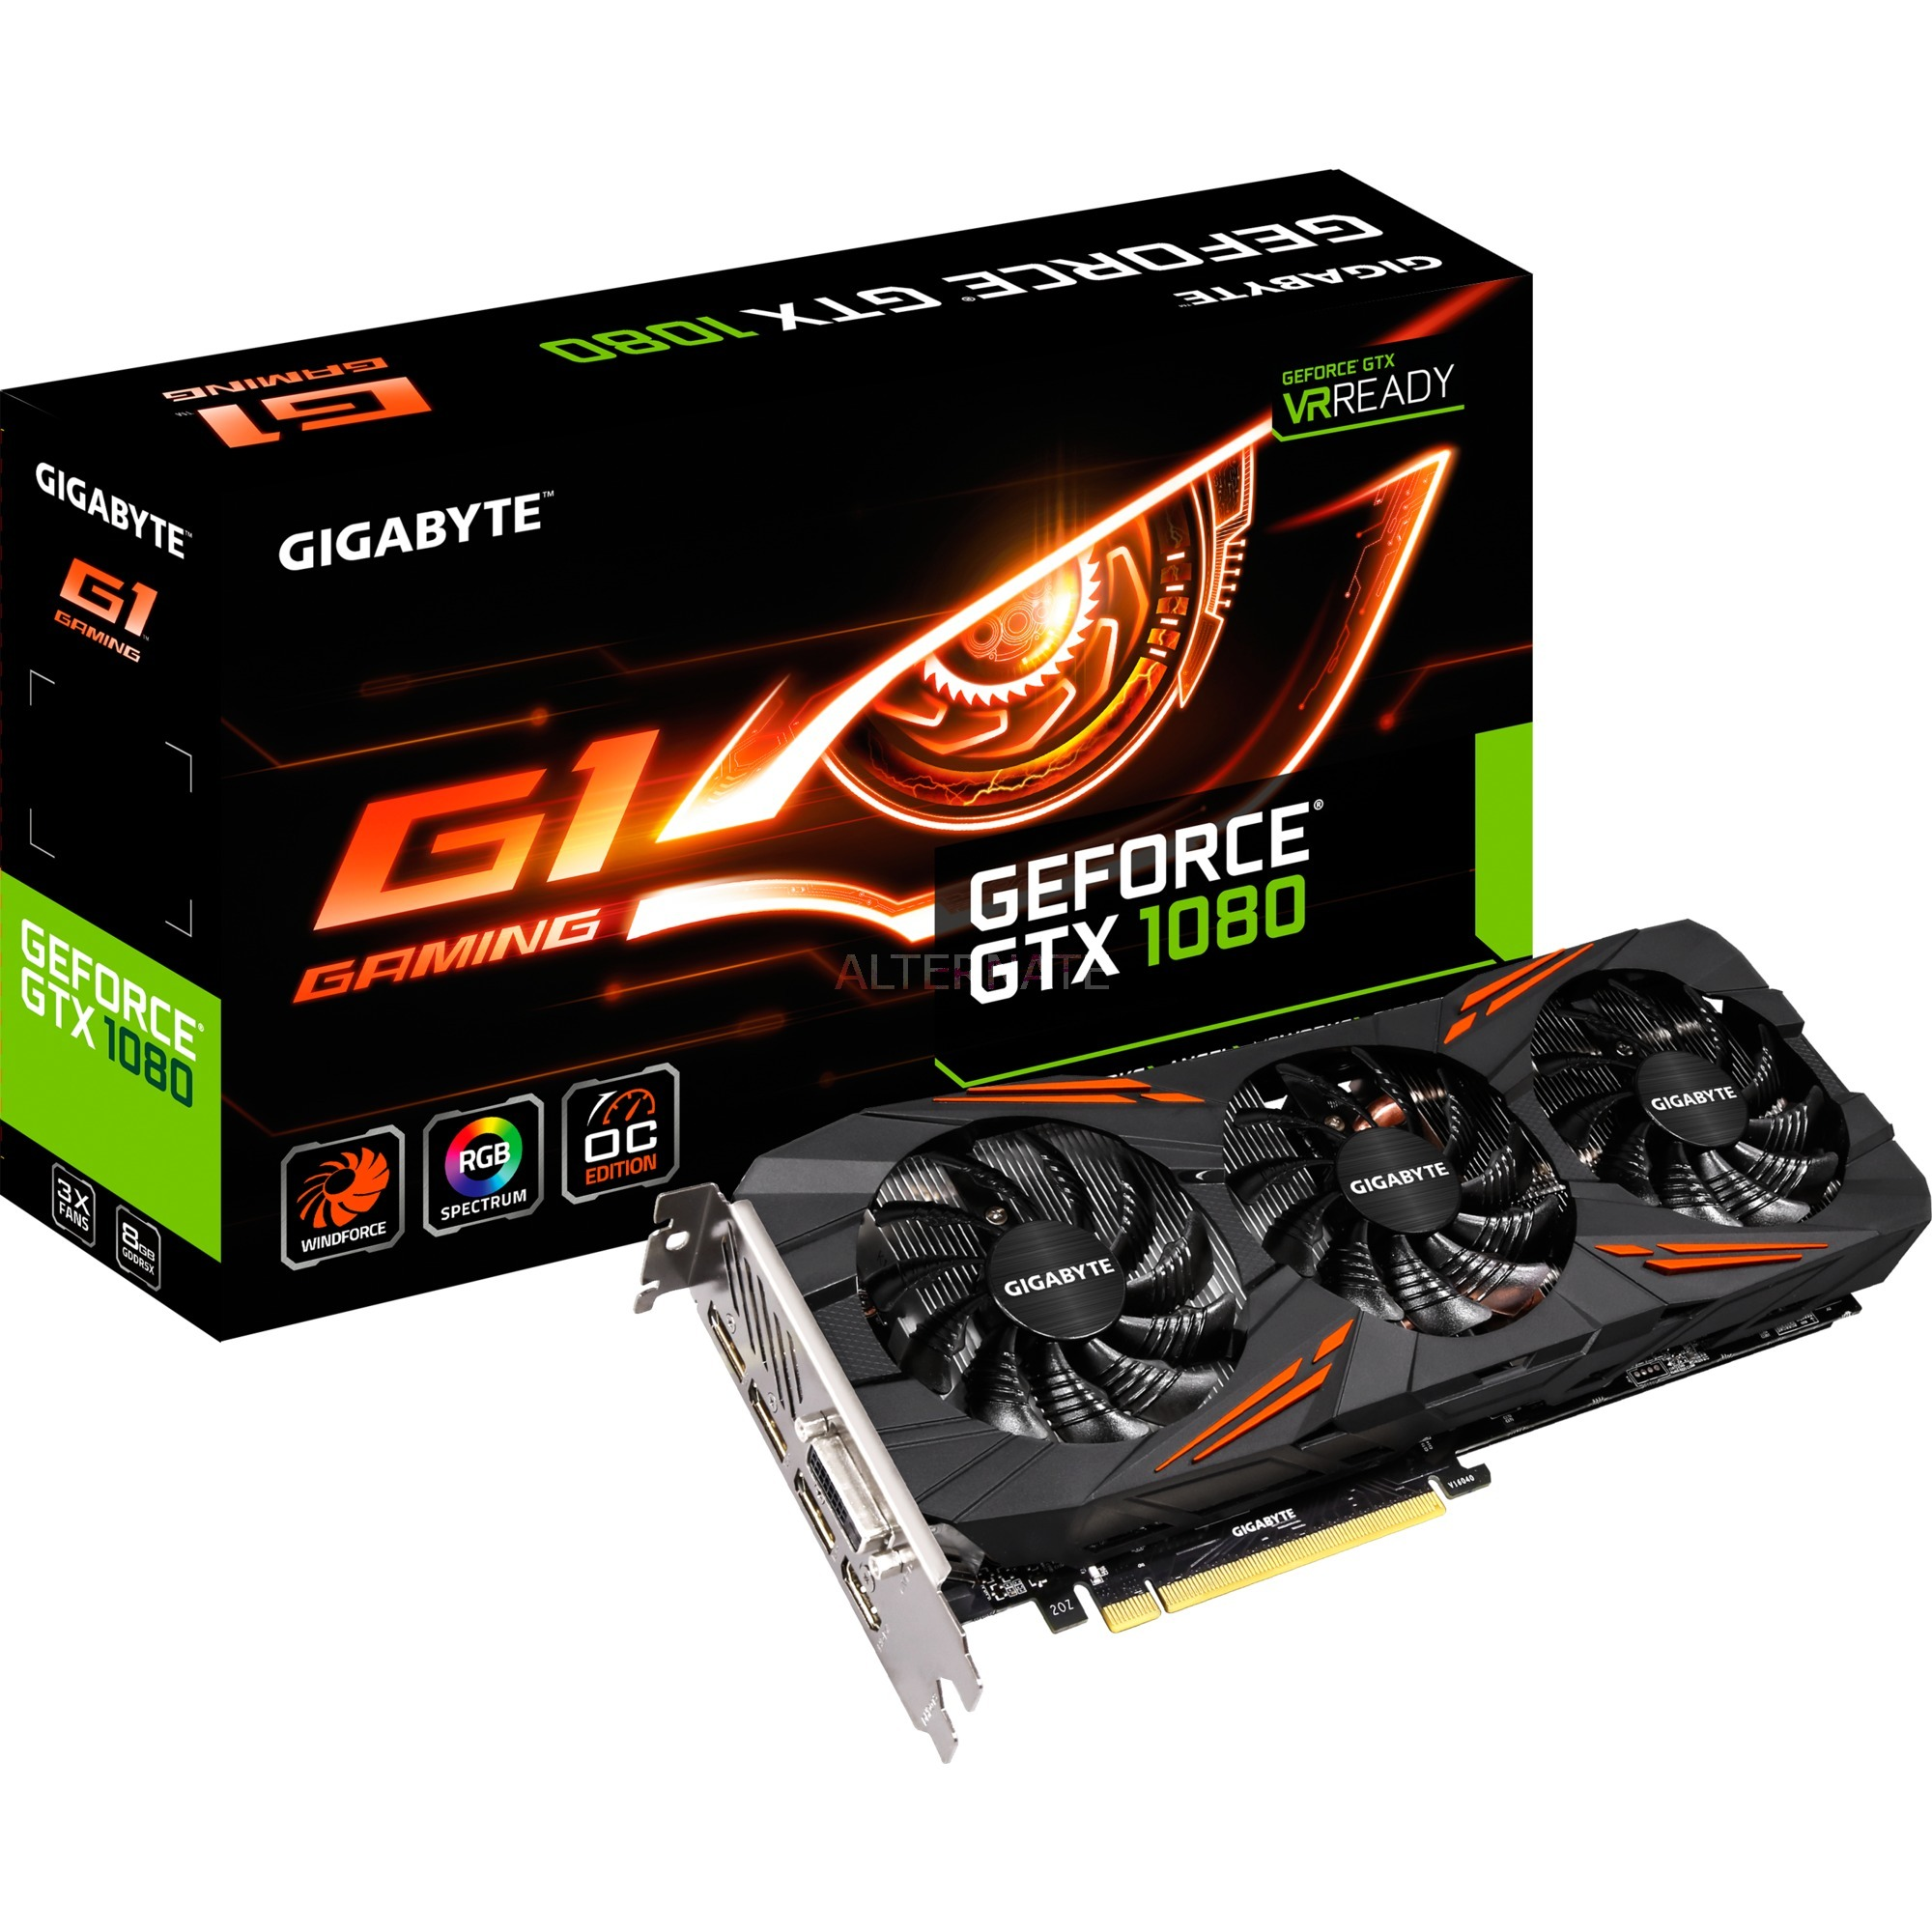 GeForce GTX 1080 G1 Gaming, Carte graphique